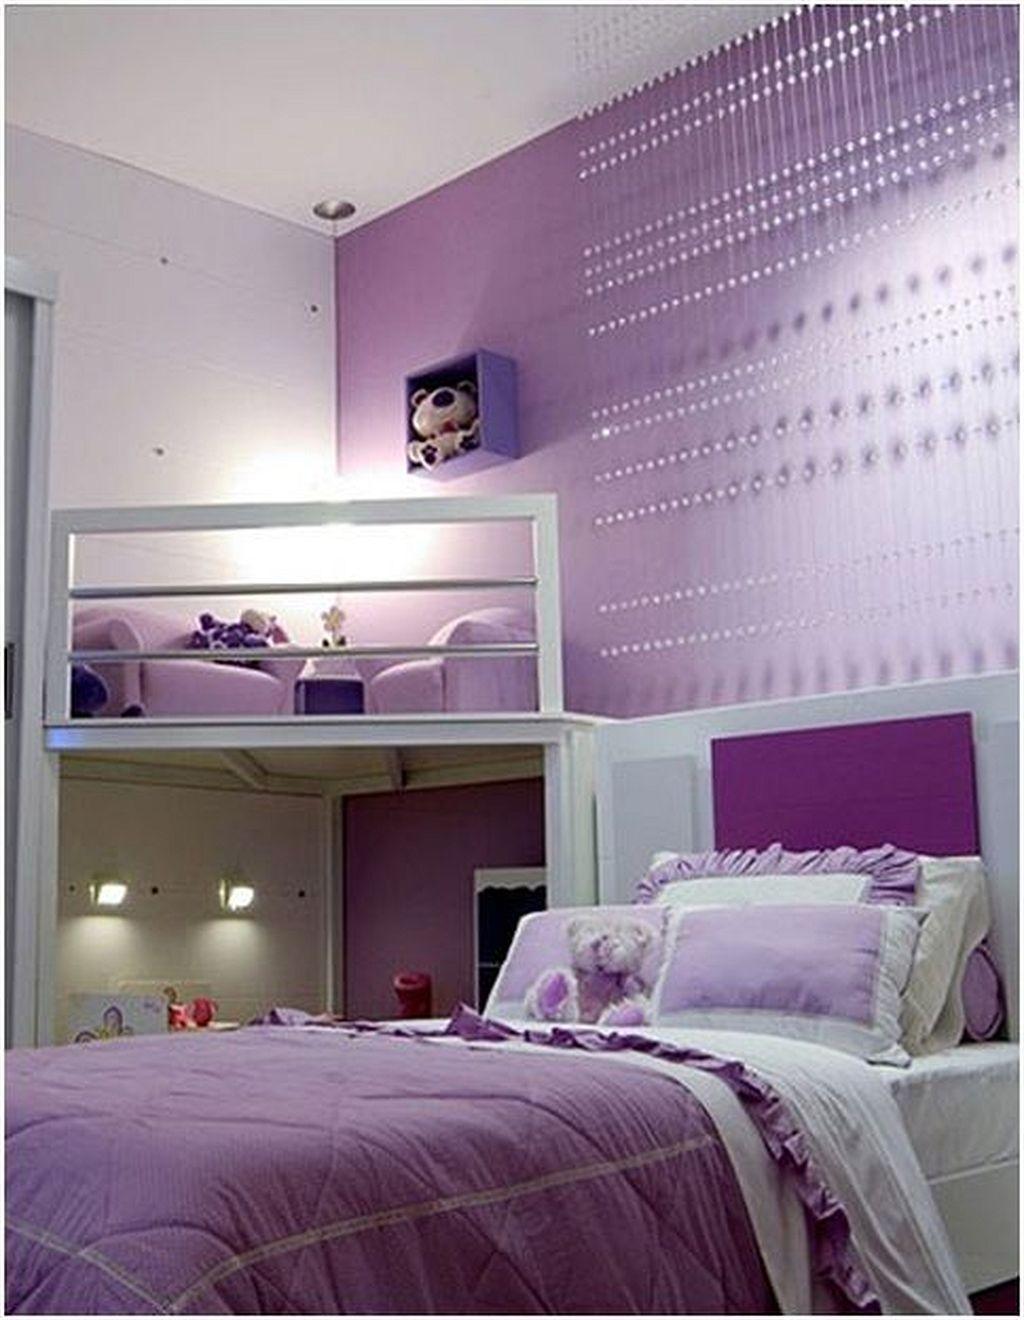 Single girl bedroom design ideas